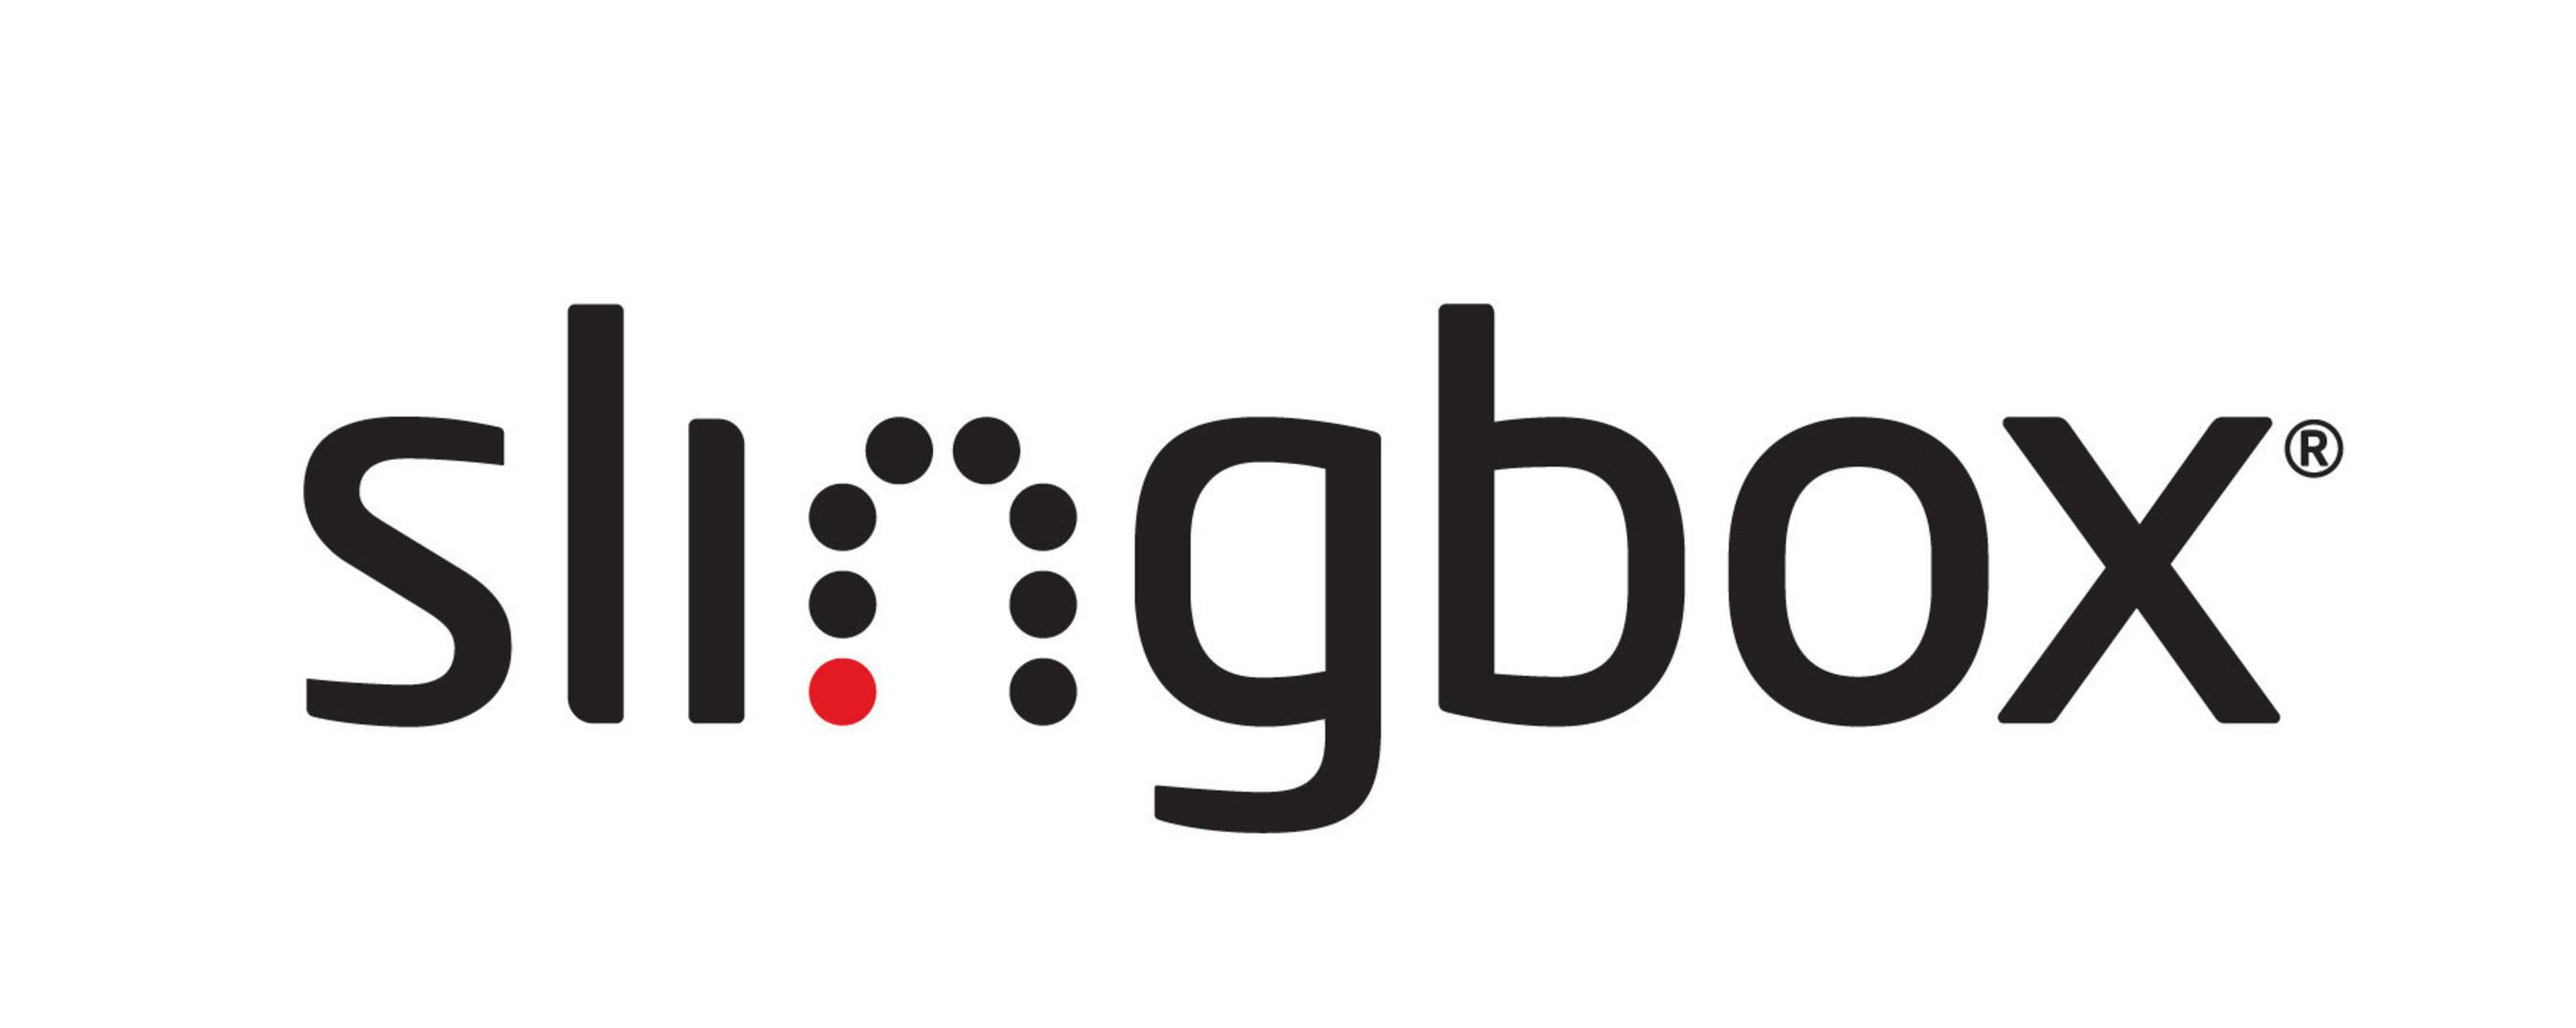 「Slingbox logo」の画像検索結果